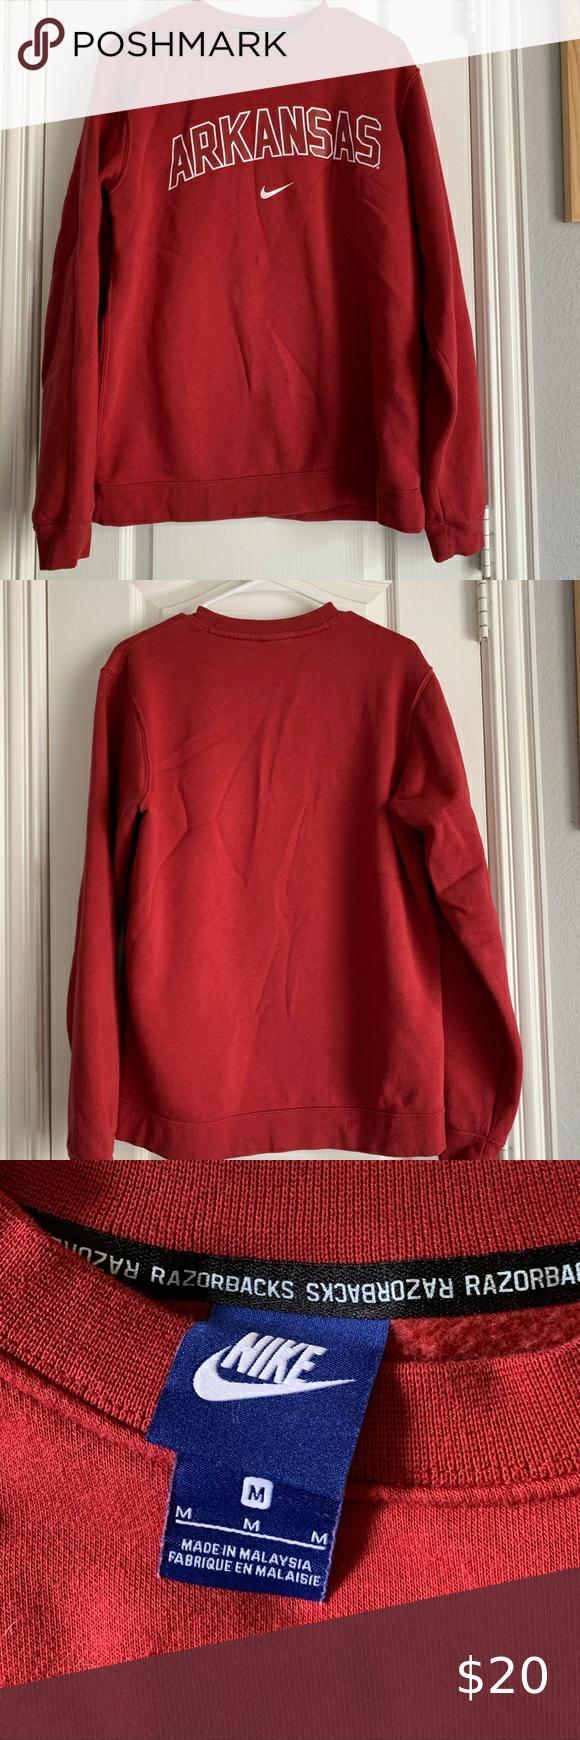 Arkansas Razorback Nike Sweatshirt Nike Sweatshirts Sweatshirts Nike Sweater [ 1740 x 580 Pixel ]